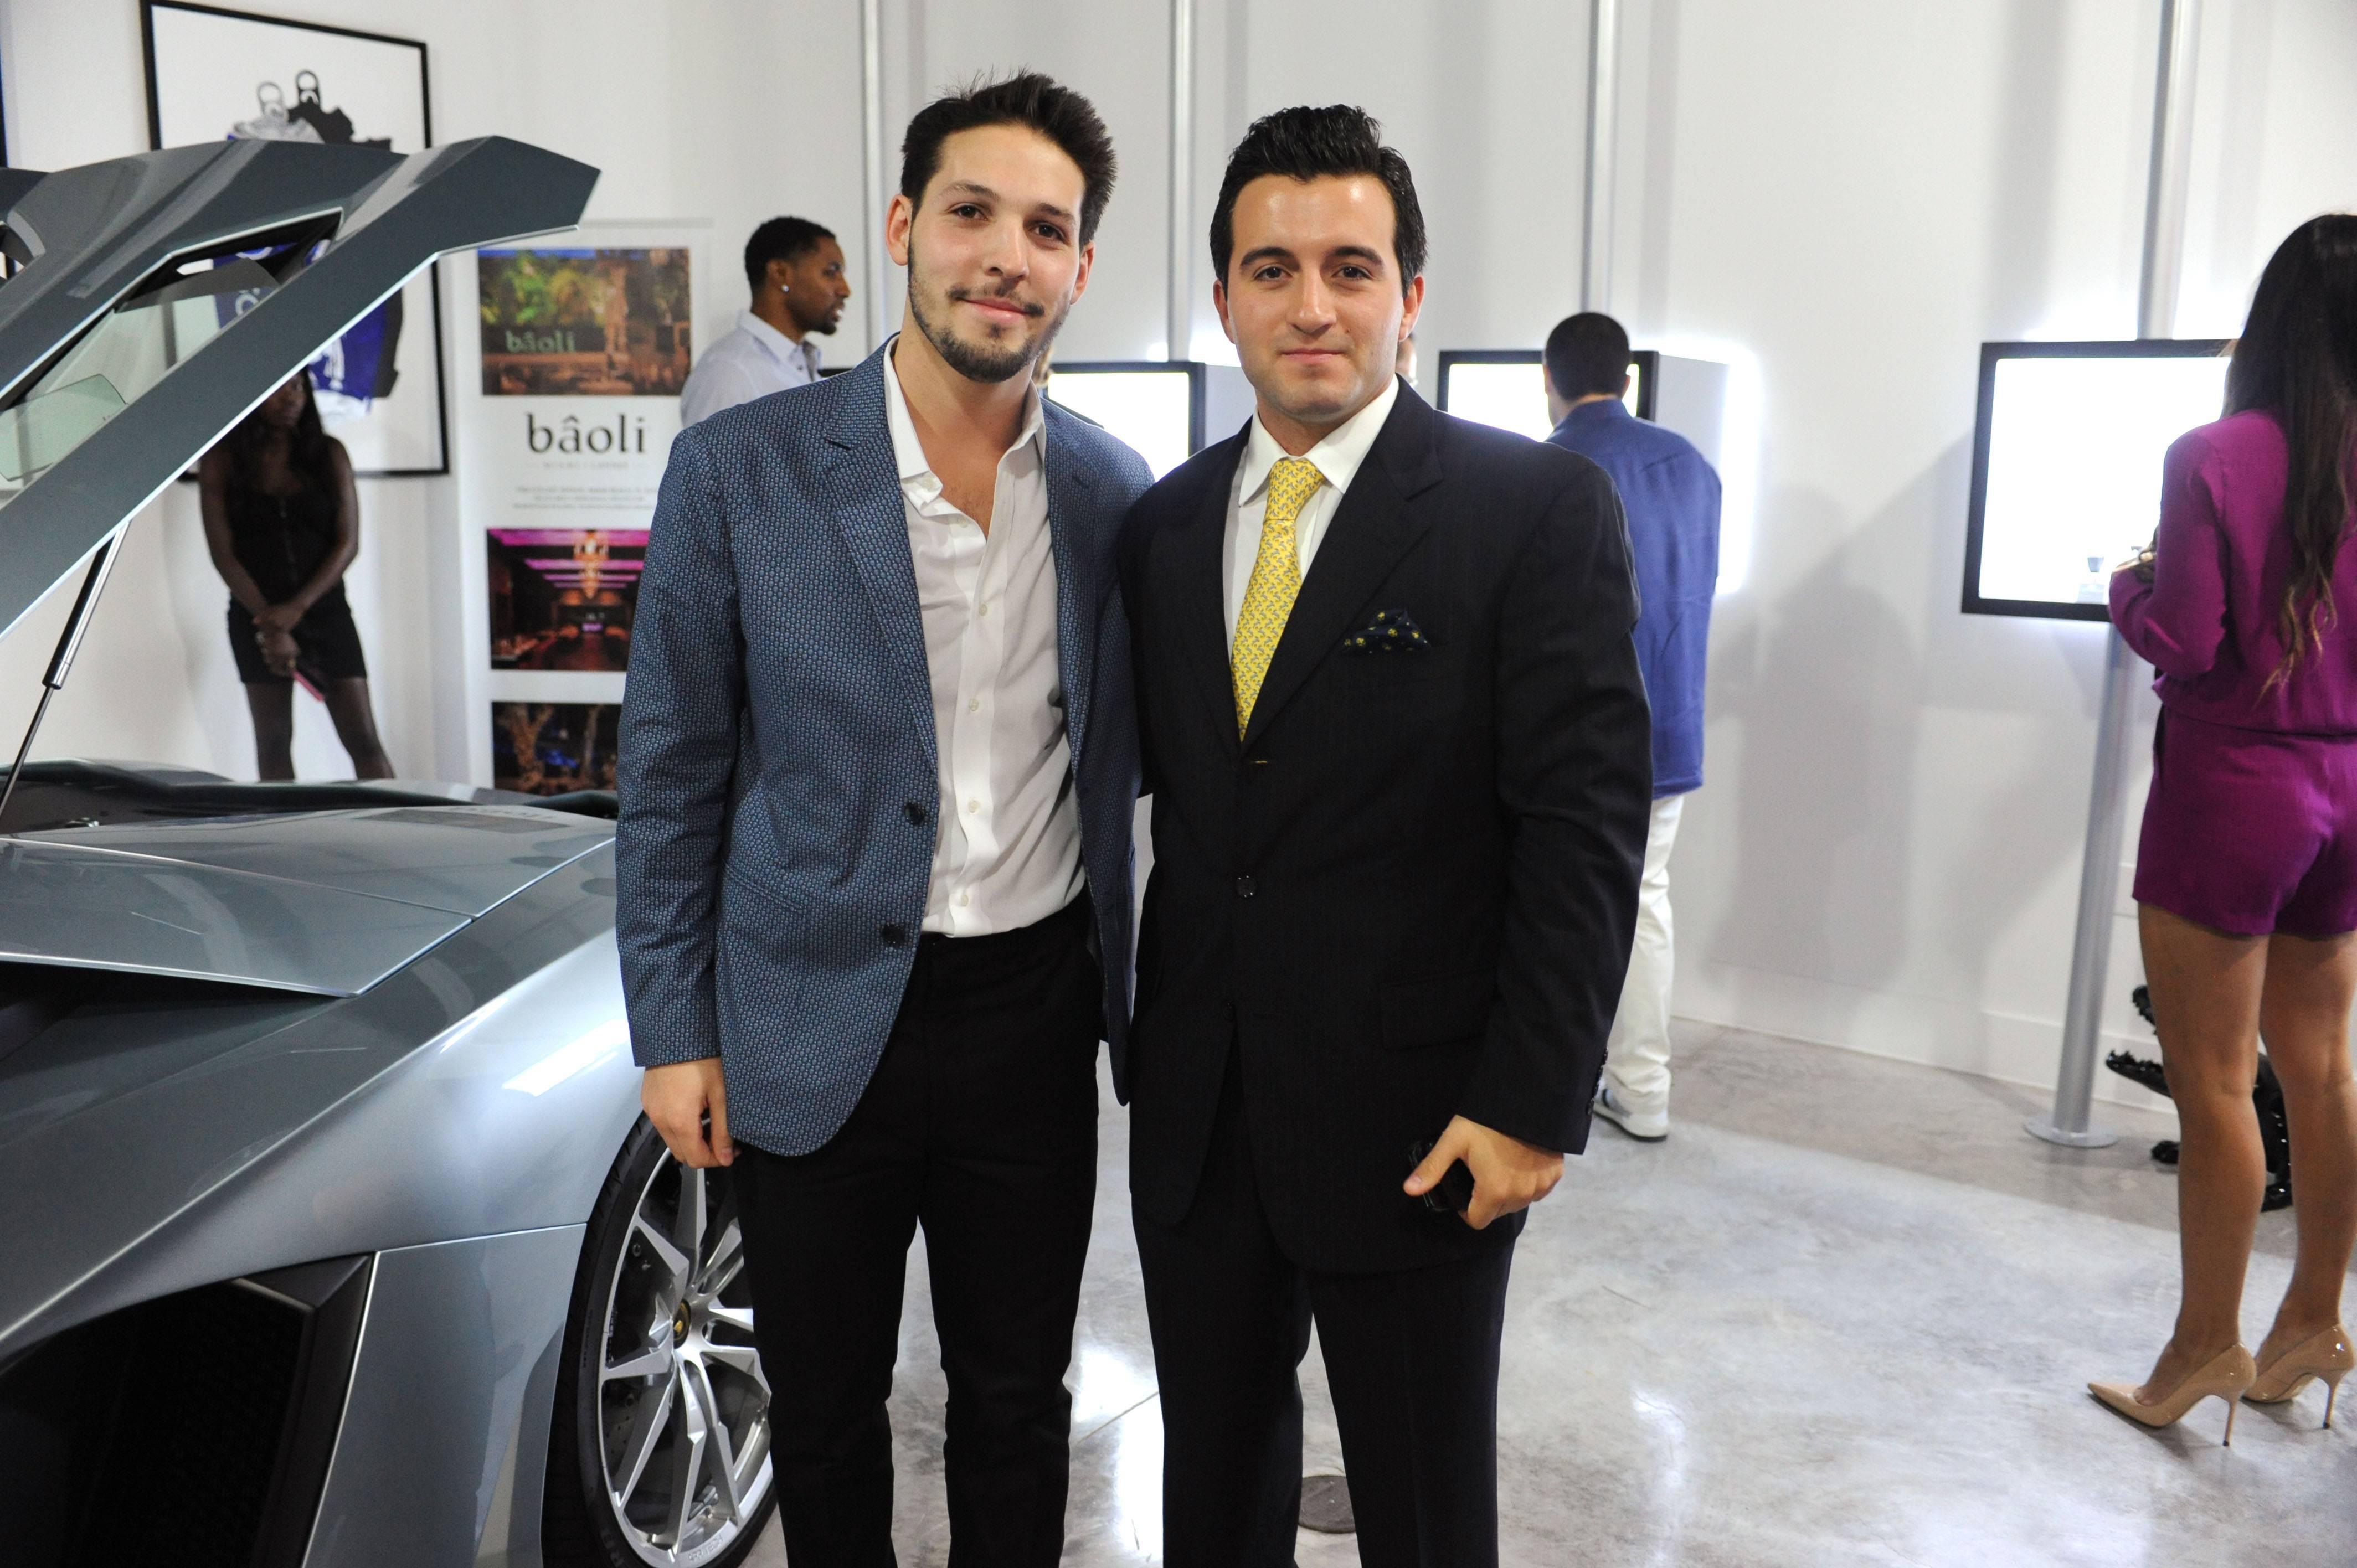 Rafael Gill & Danilo Diazgranados